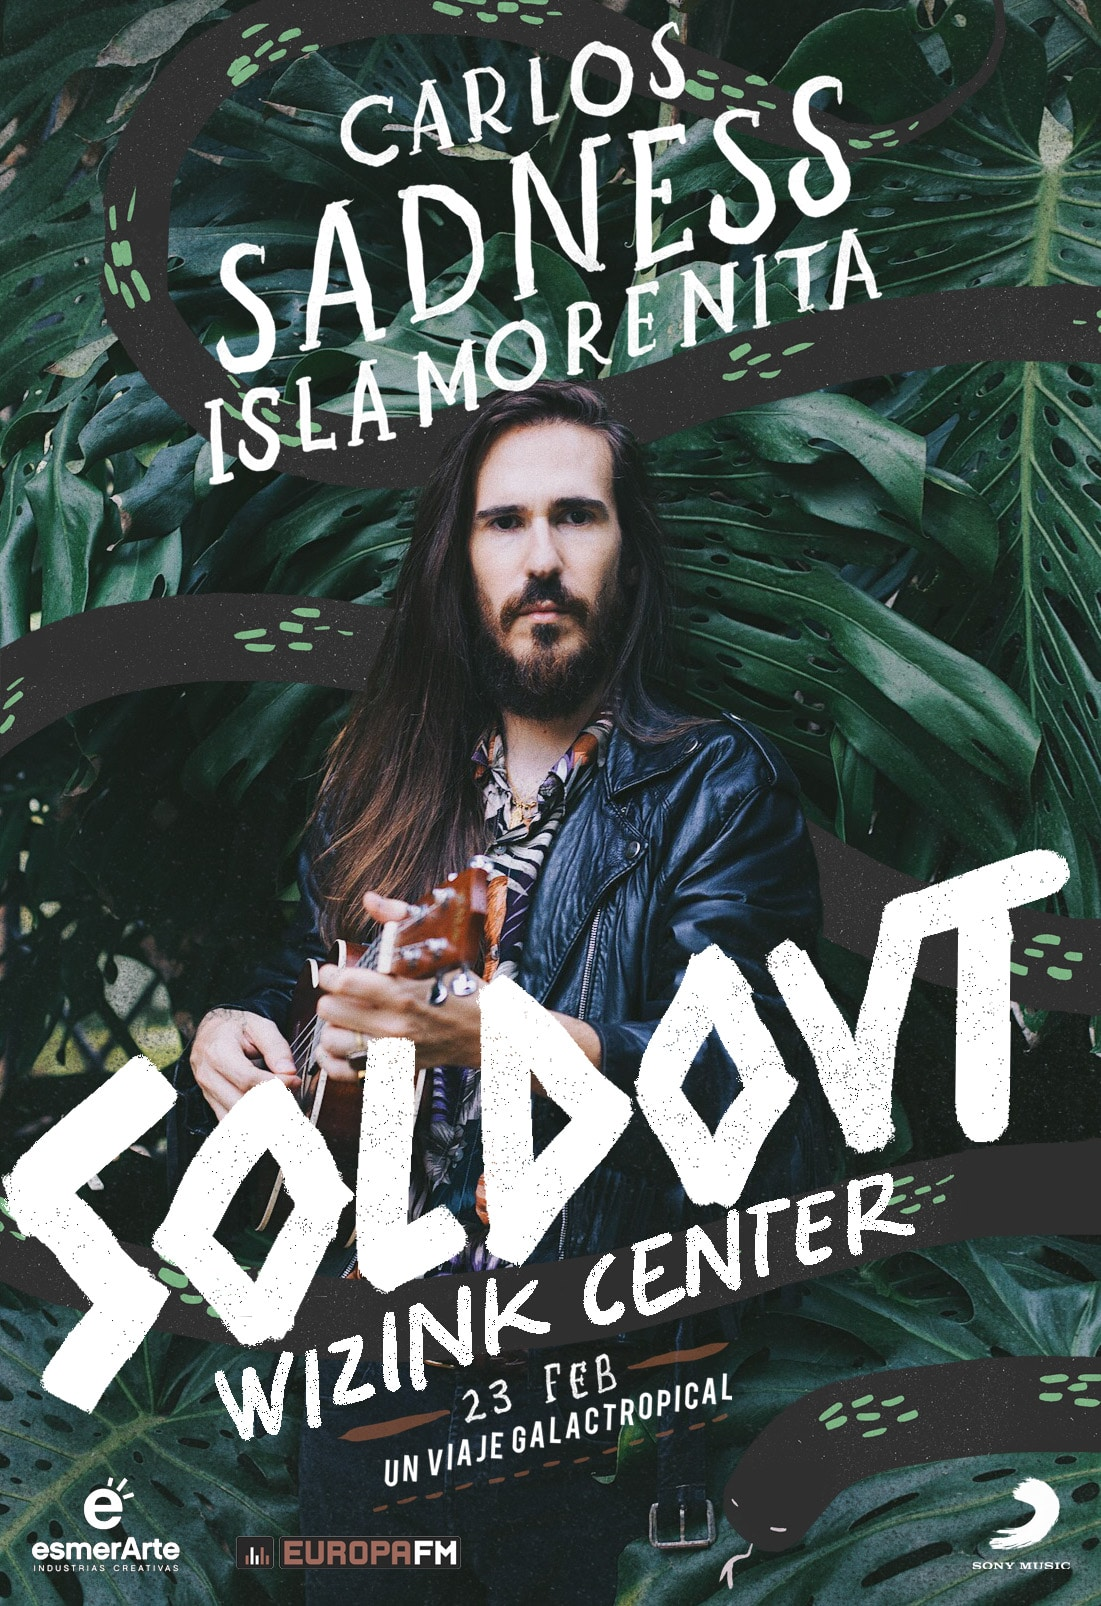 Carlos Sadness Isla Morenita Sold Out